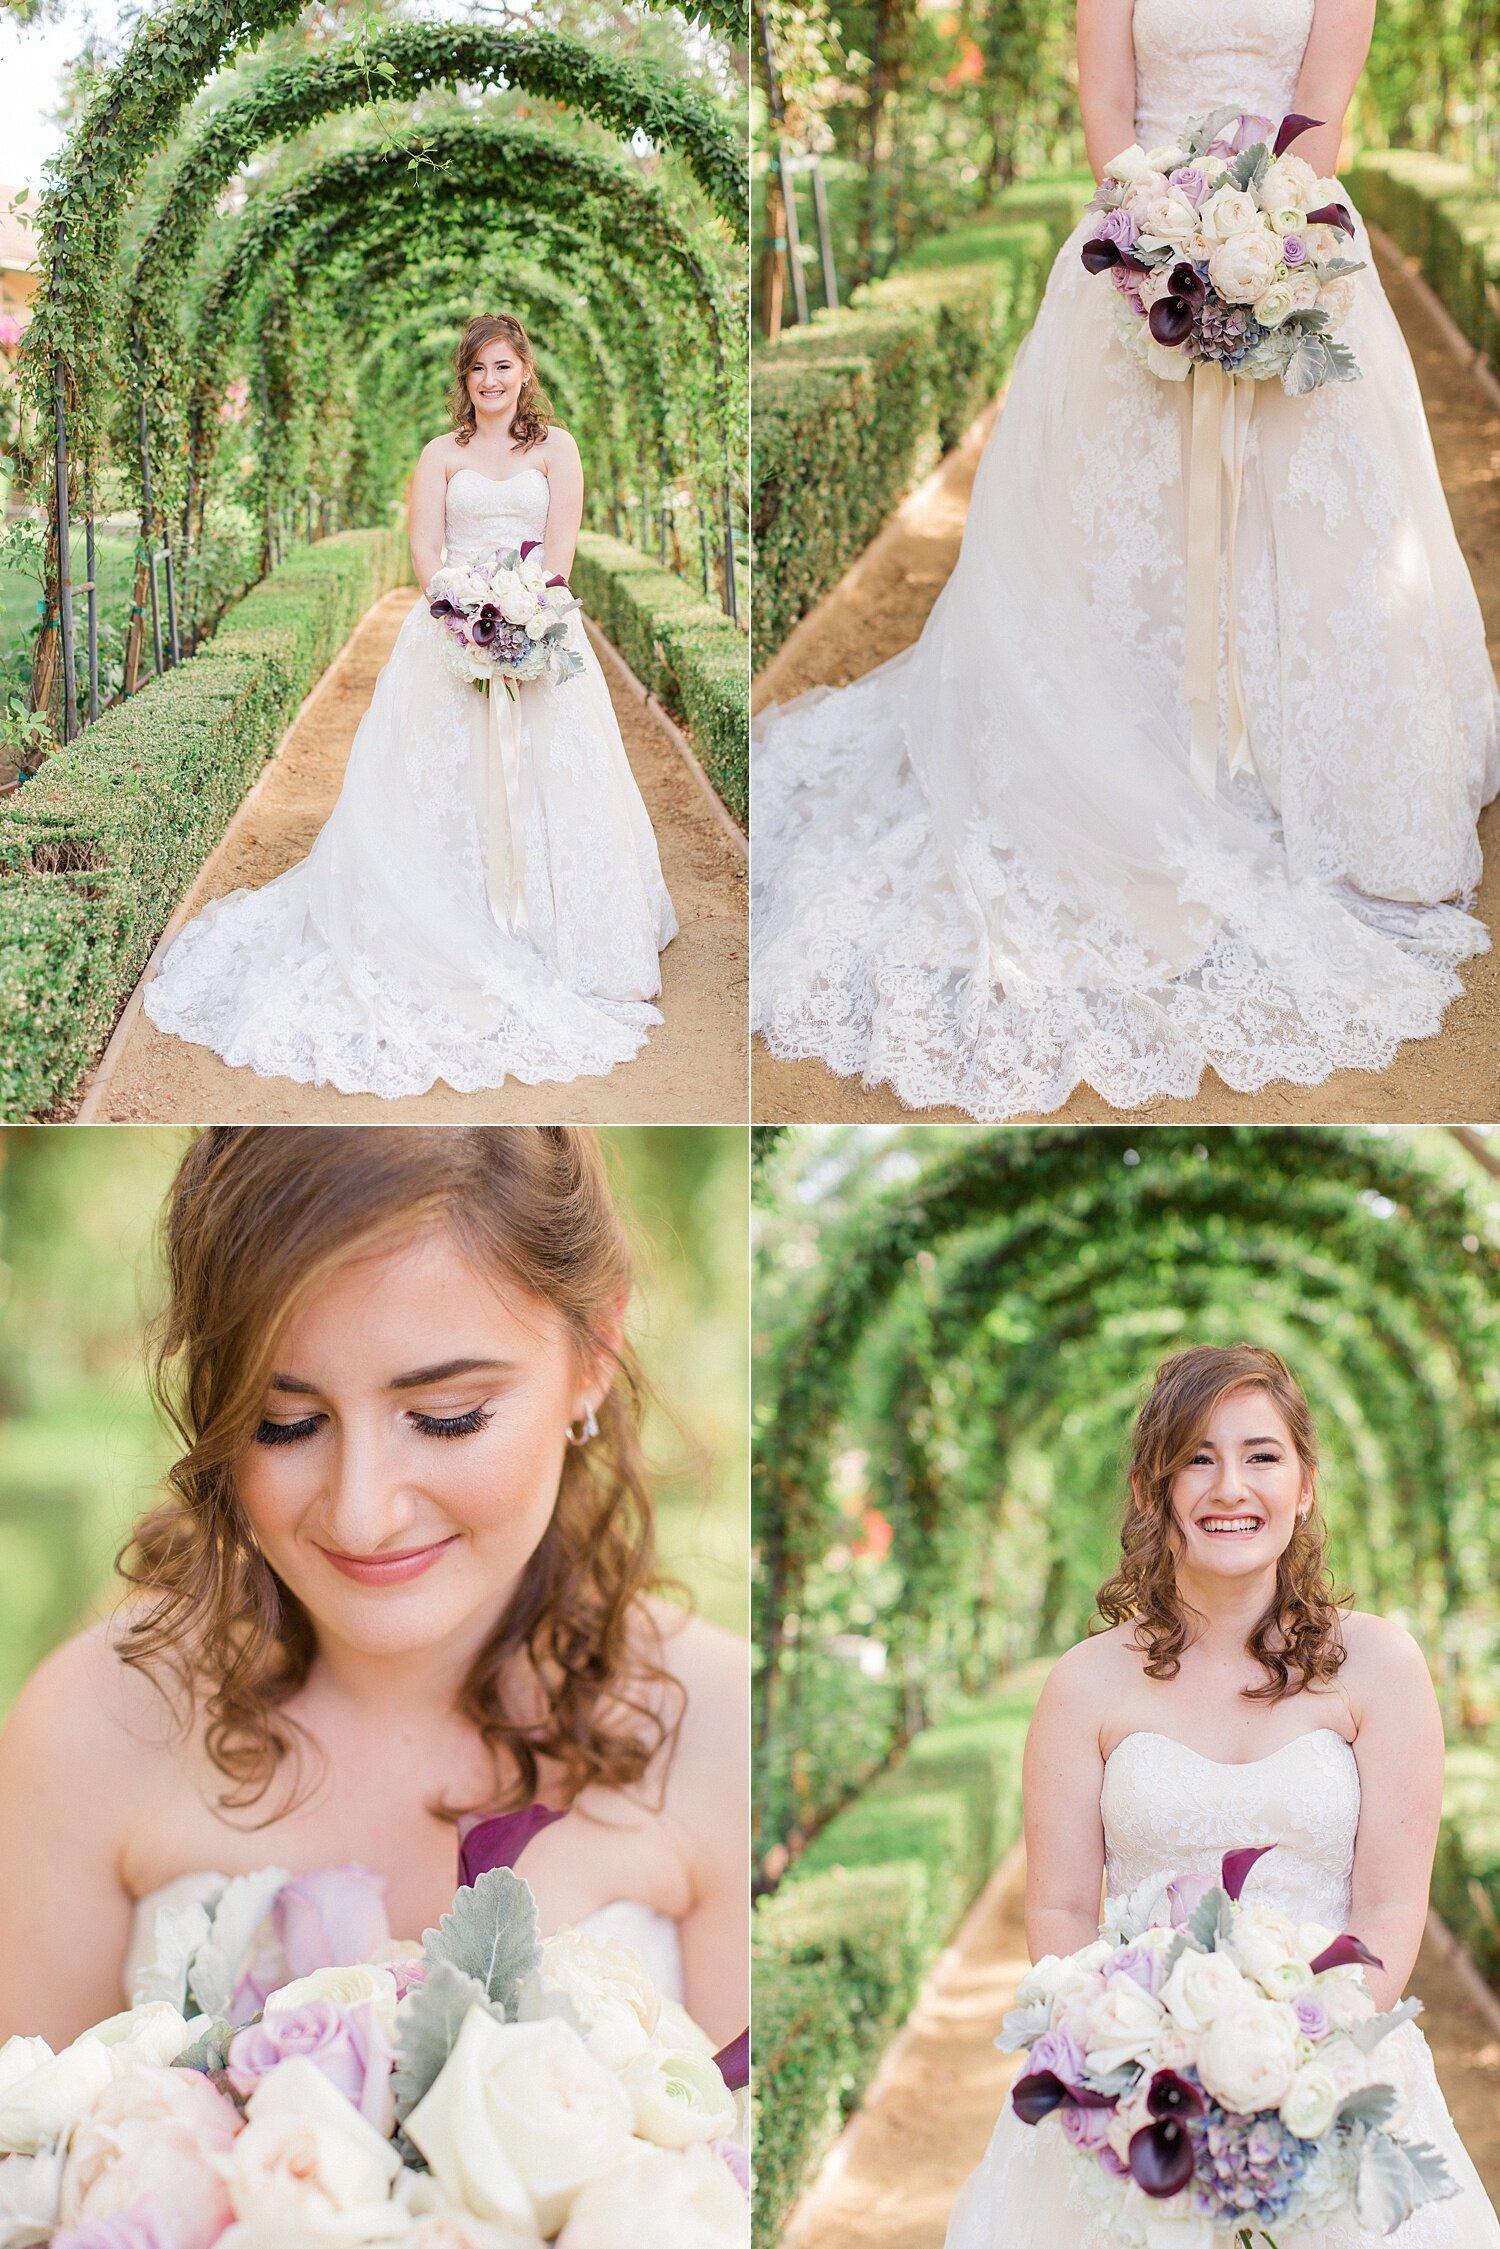 westlake-village-inn-wedding-photographer_0113.jpg